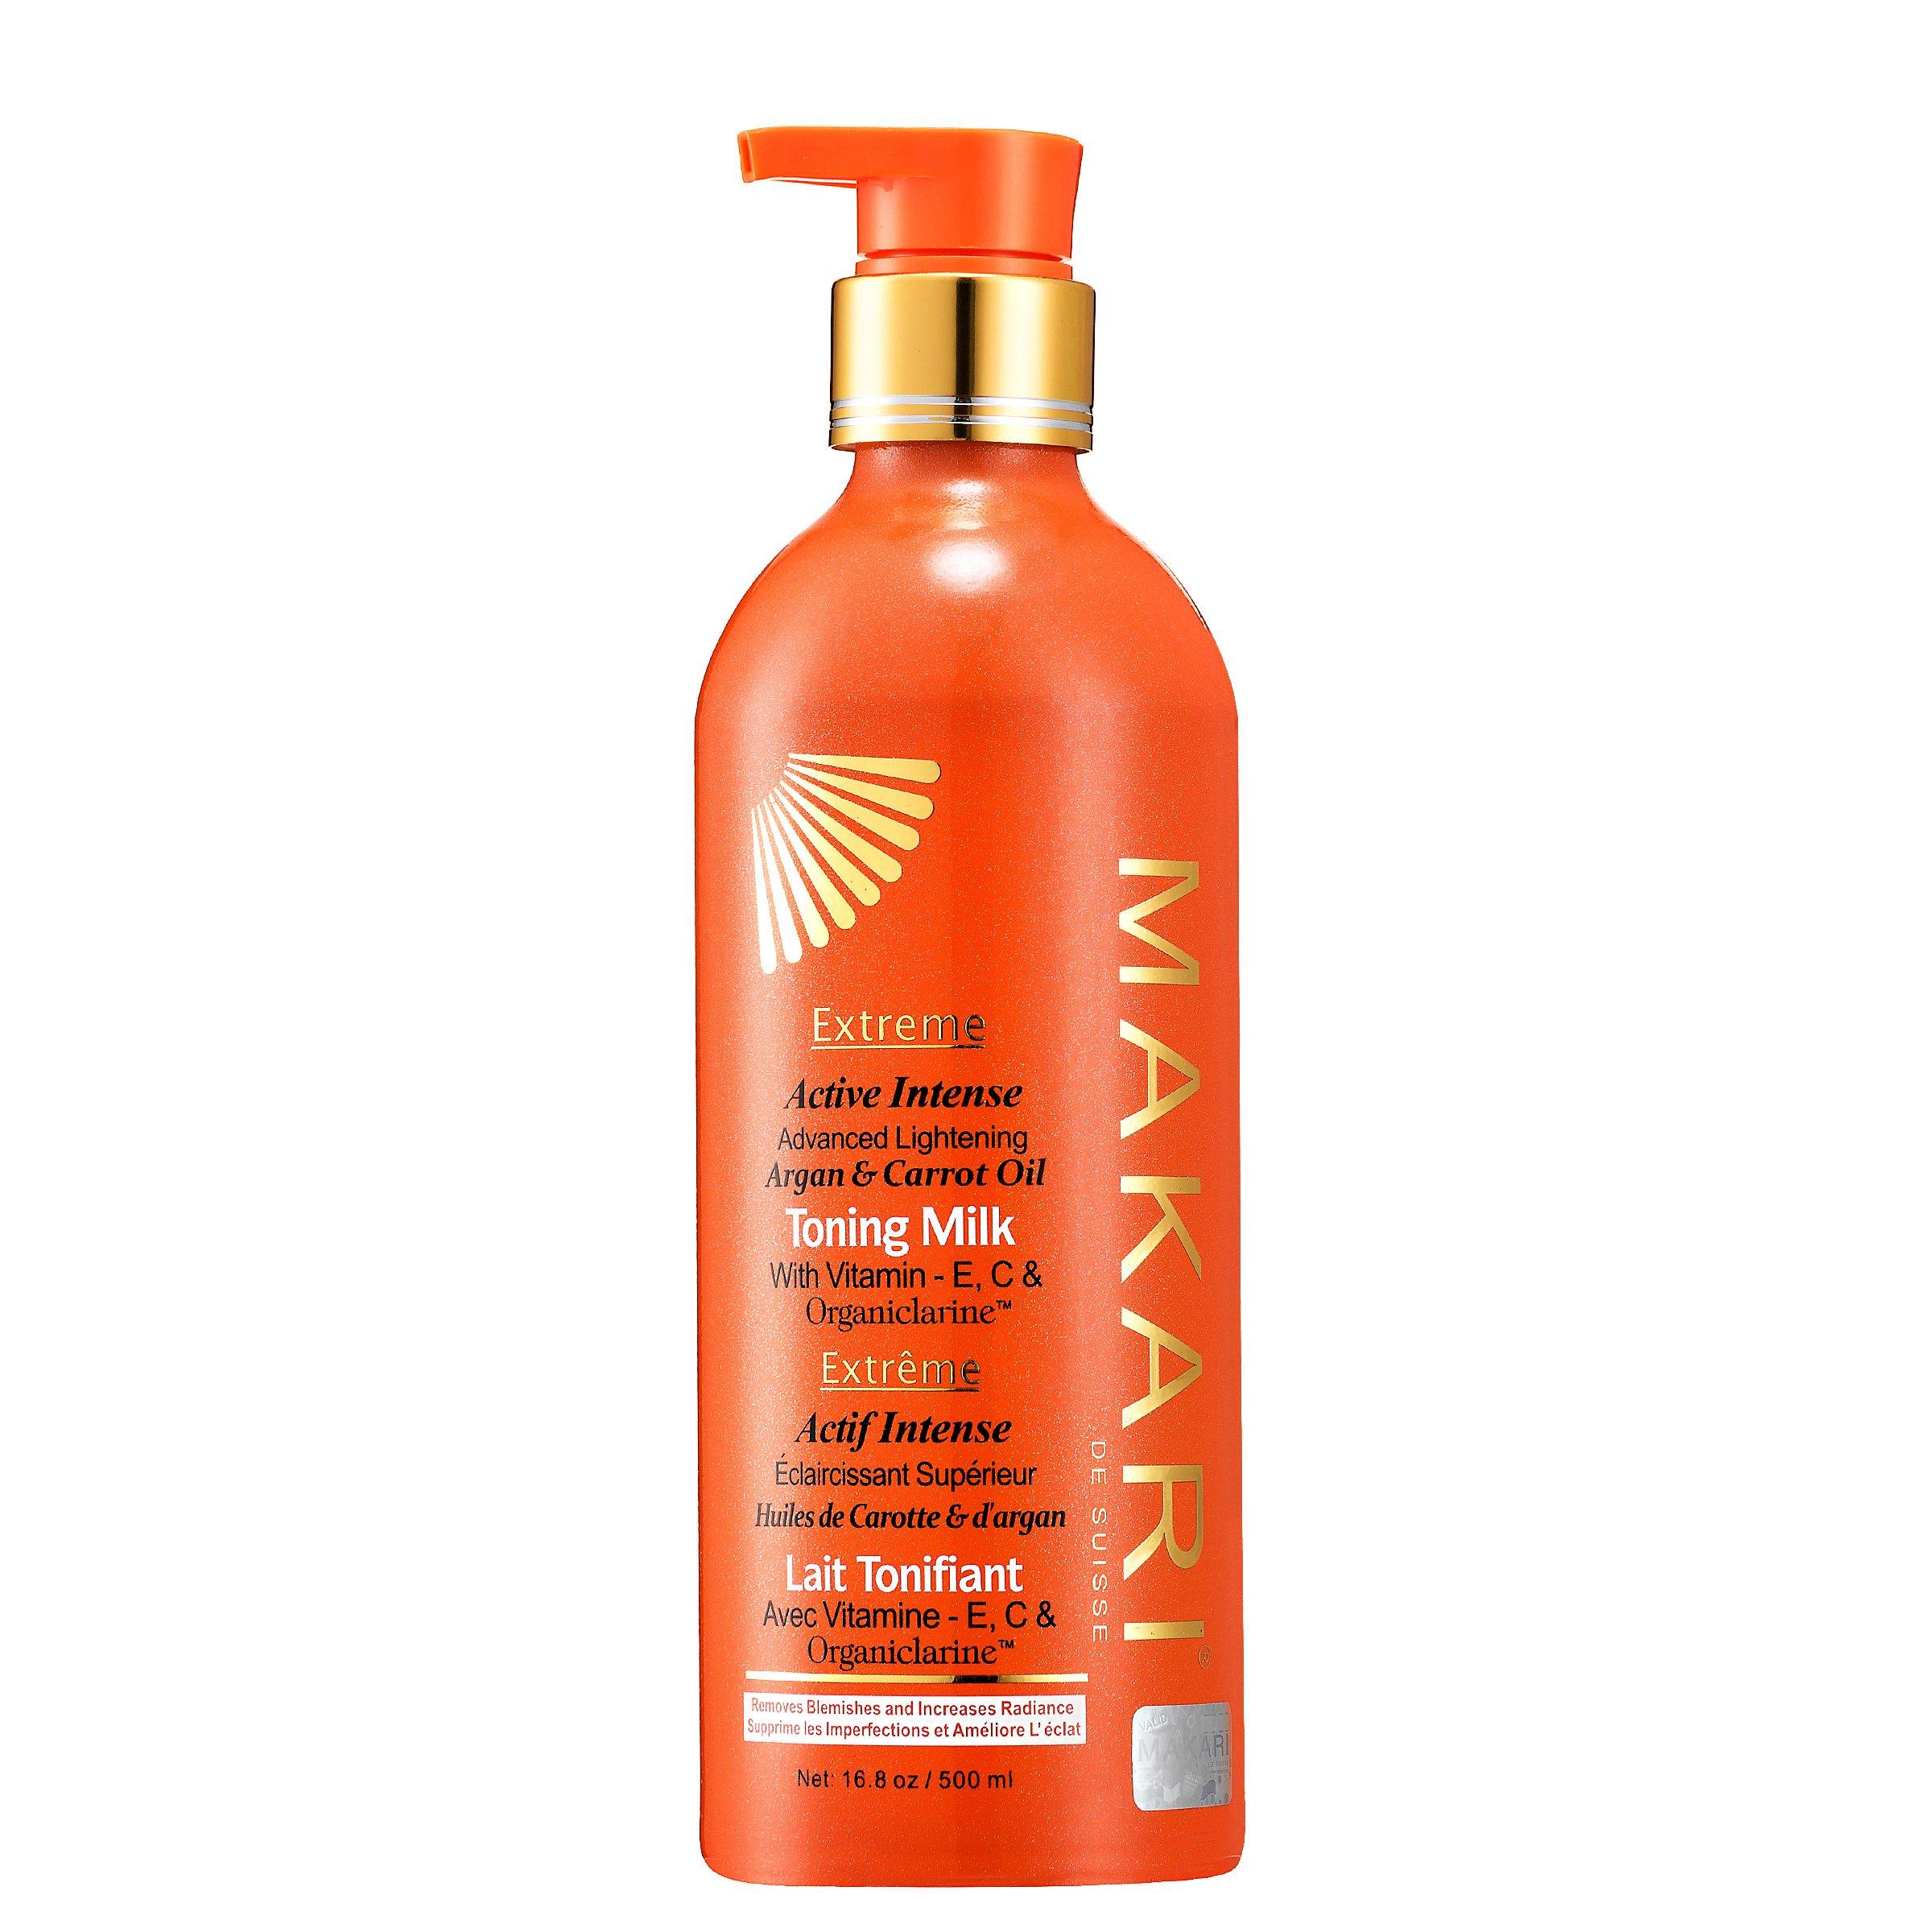 Makari Extreme Carrot & Argan Oil Skin Toning Milk 16.8oz – Lightening, Brightening & Tightening Body Lotion with Organiclarine – Whitening & Anti-Aging Treatment for Dark Spots, Acne